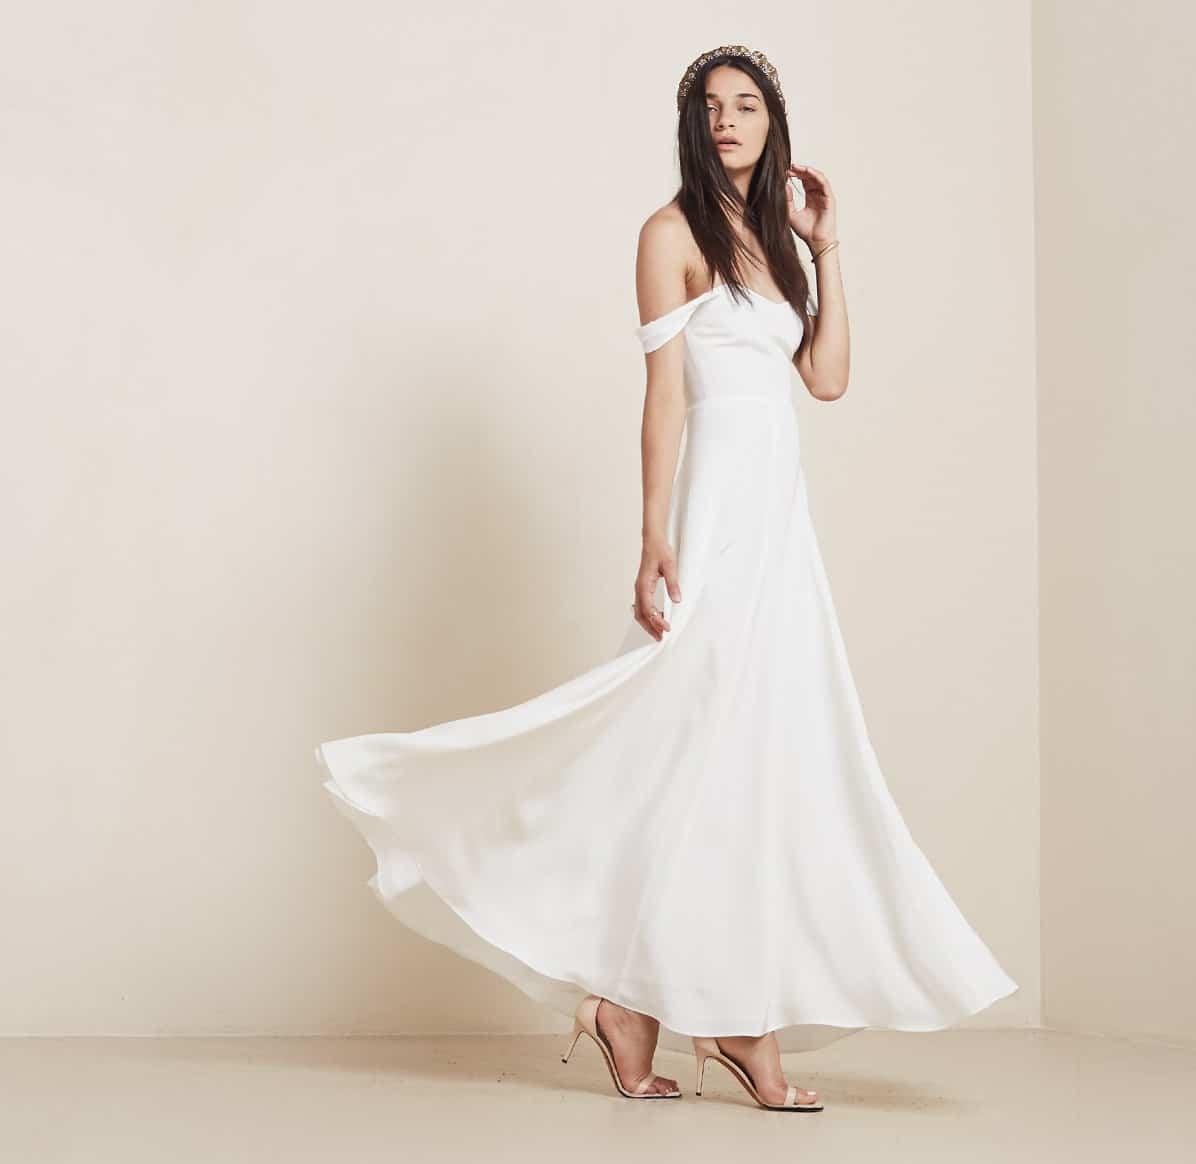 Constance dress by reformation top 5 wedding dresses for Best wedding dresses under 1000